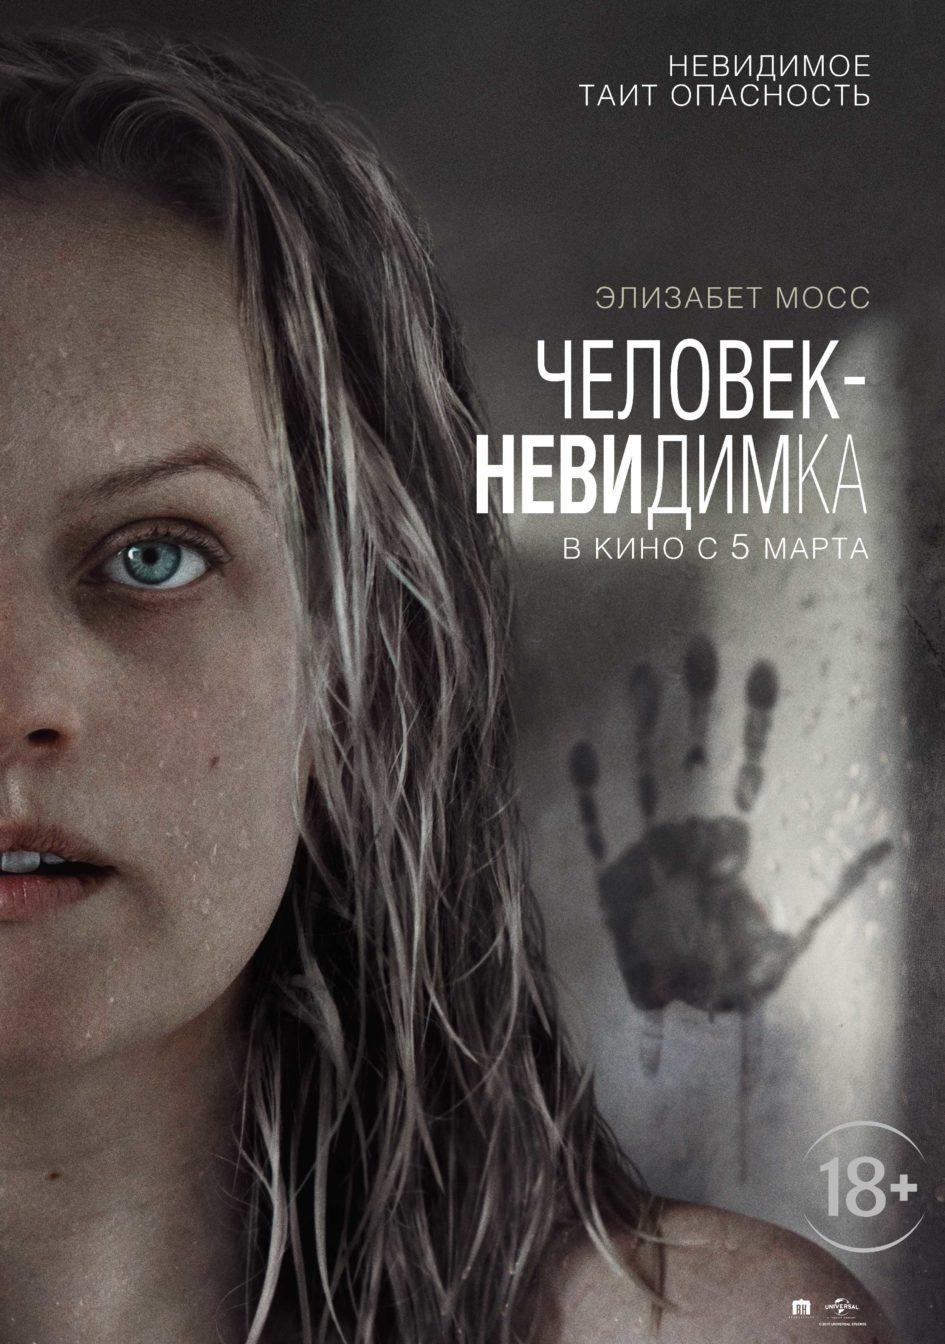 Человек-невидимка (2020) - OST